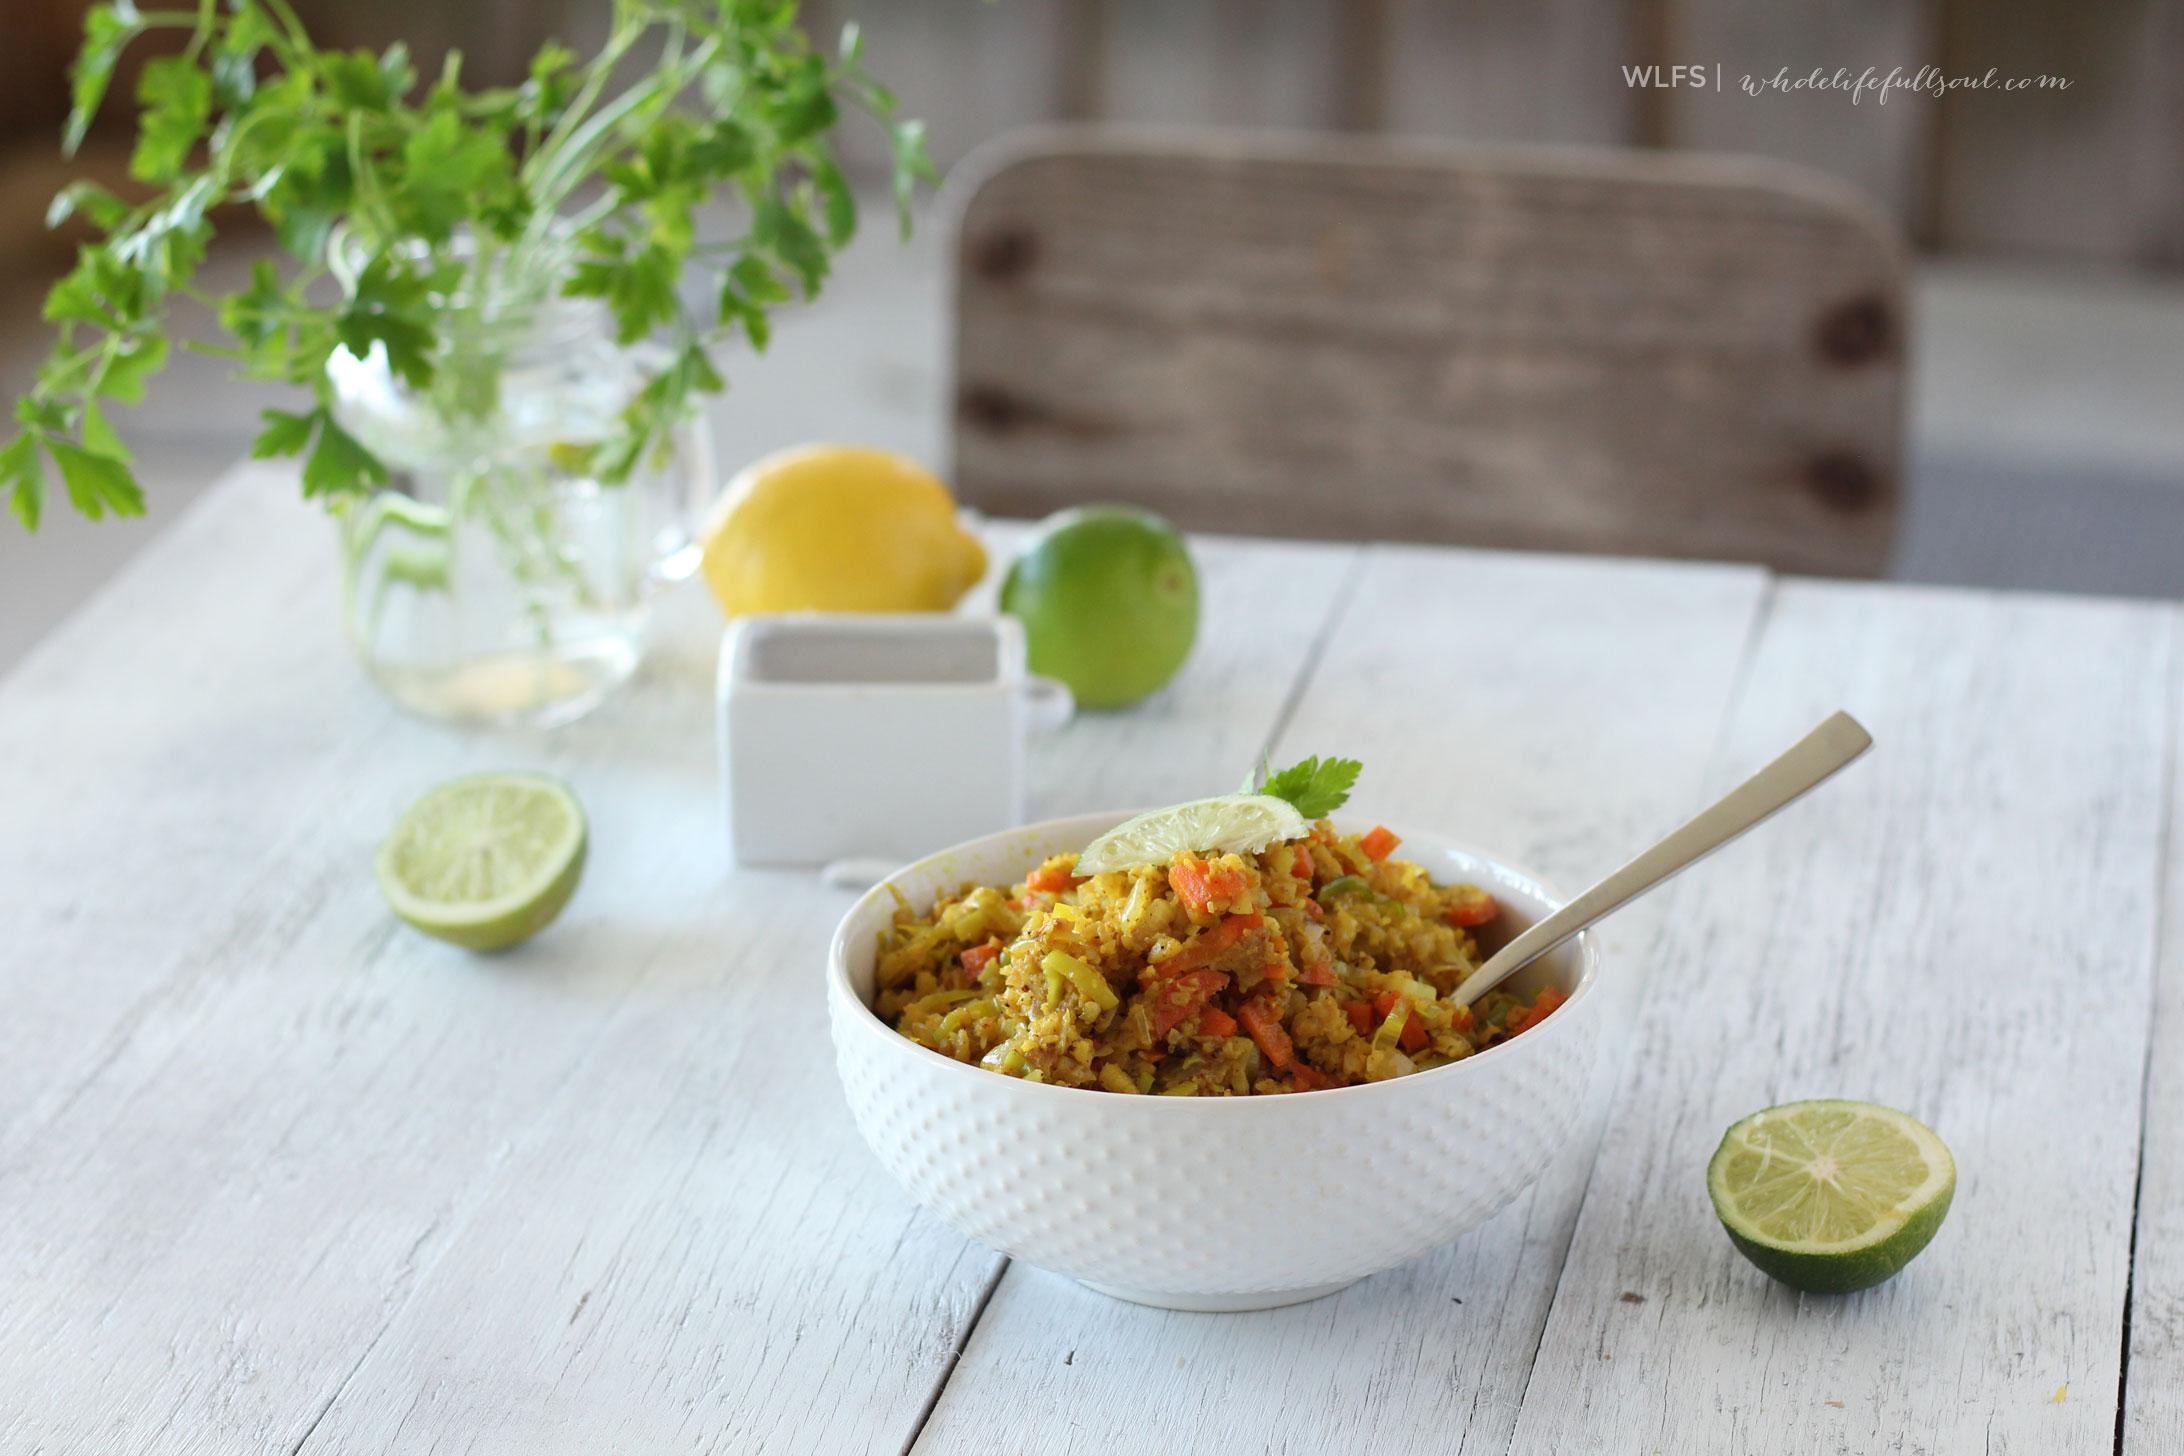 Cauliflower & Leek Turmeric Fried Rice